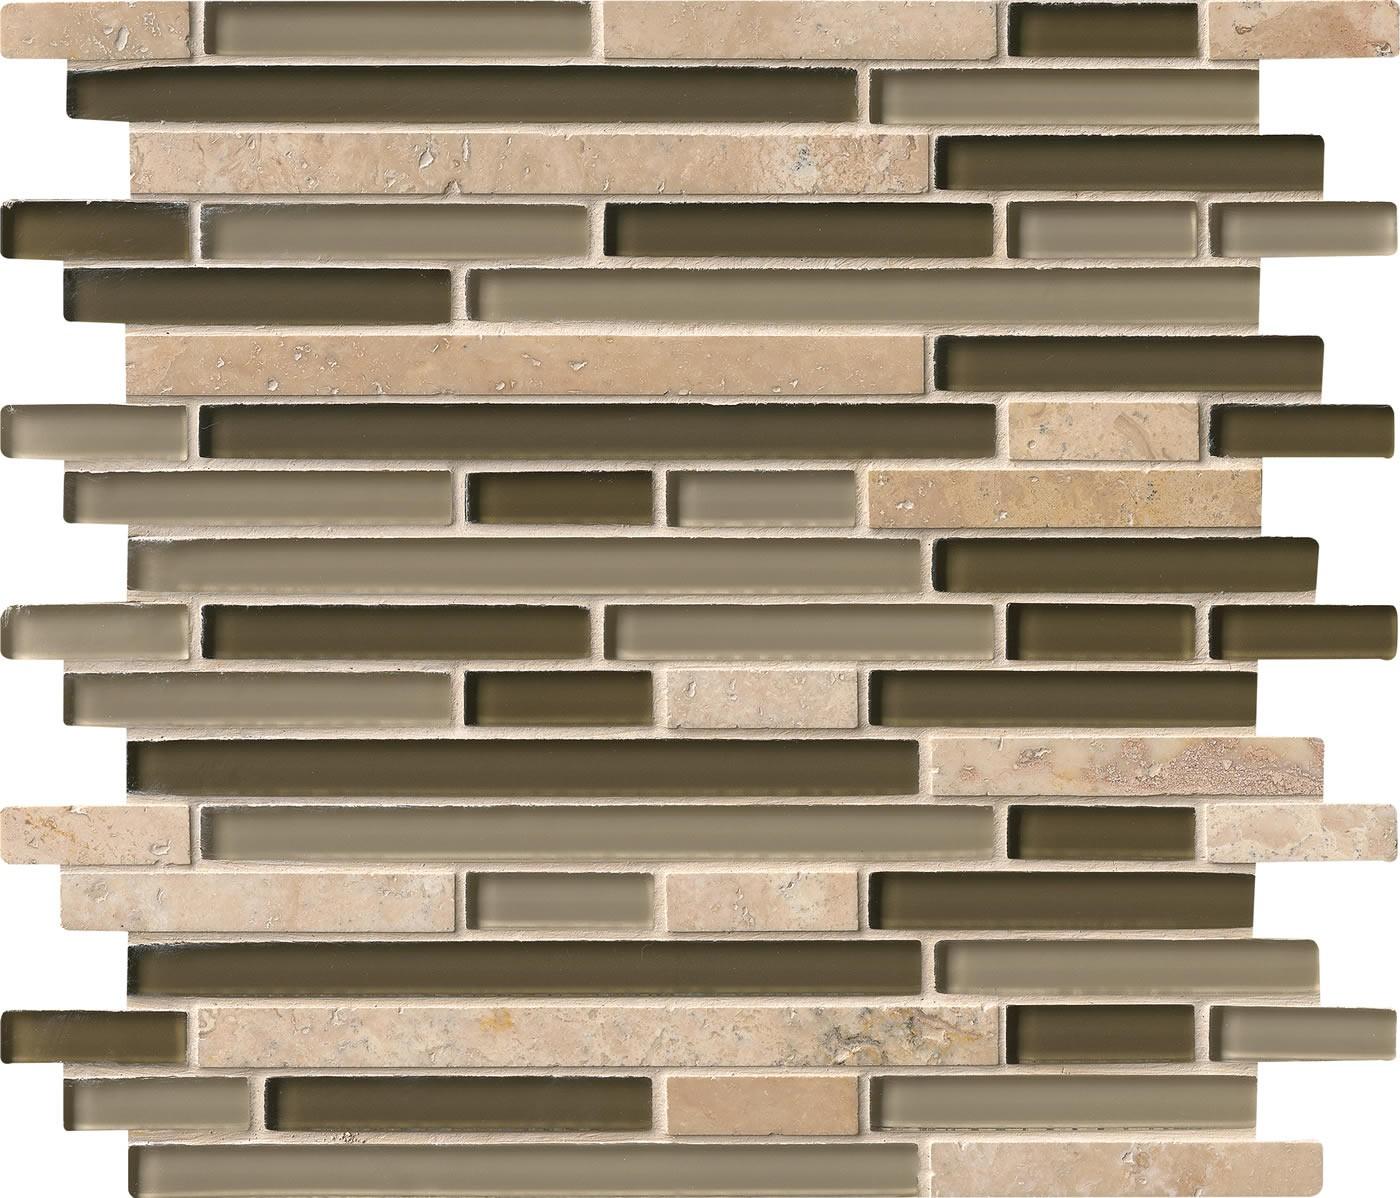 PINE VALLEY INTERLOCKING PATTERN 8MM - Upscape Tile